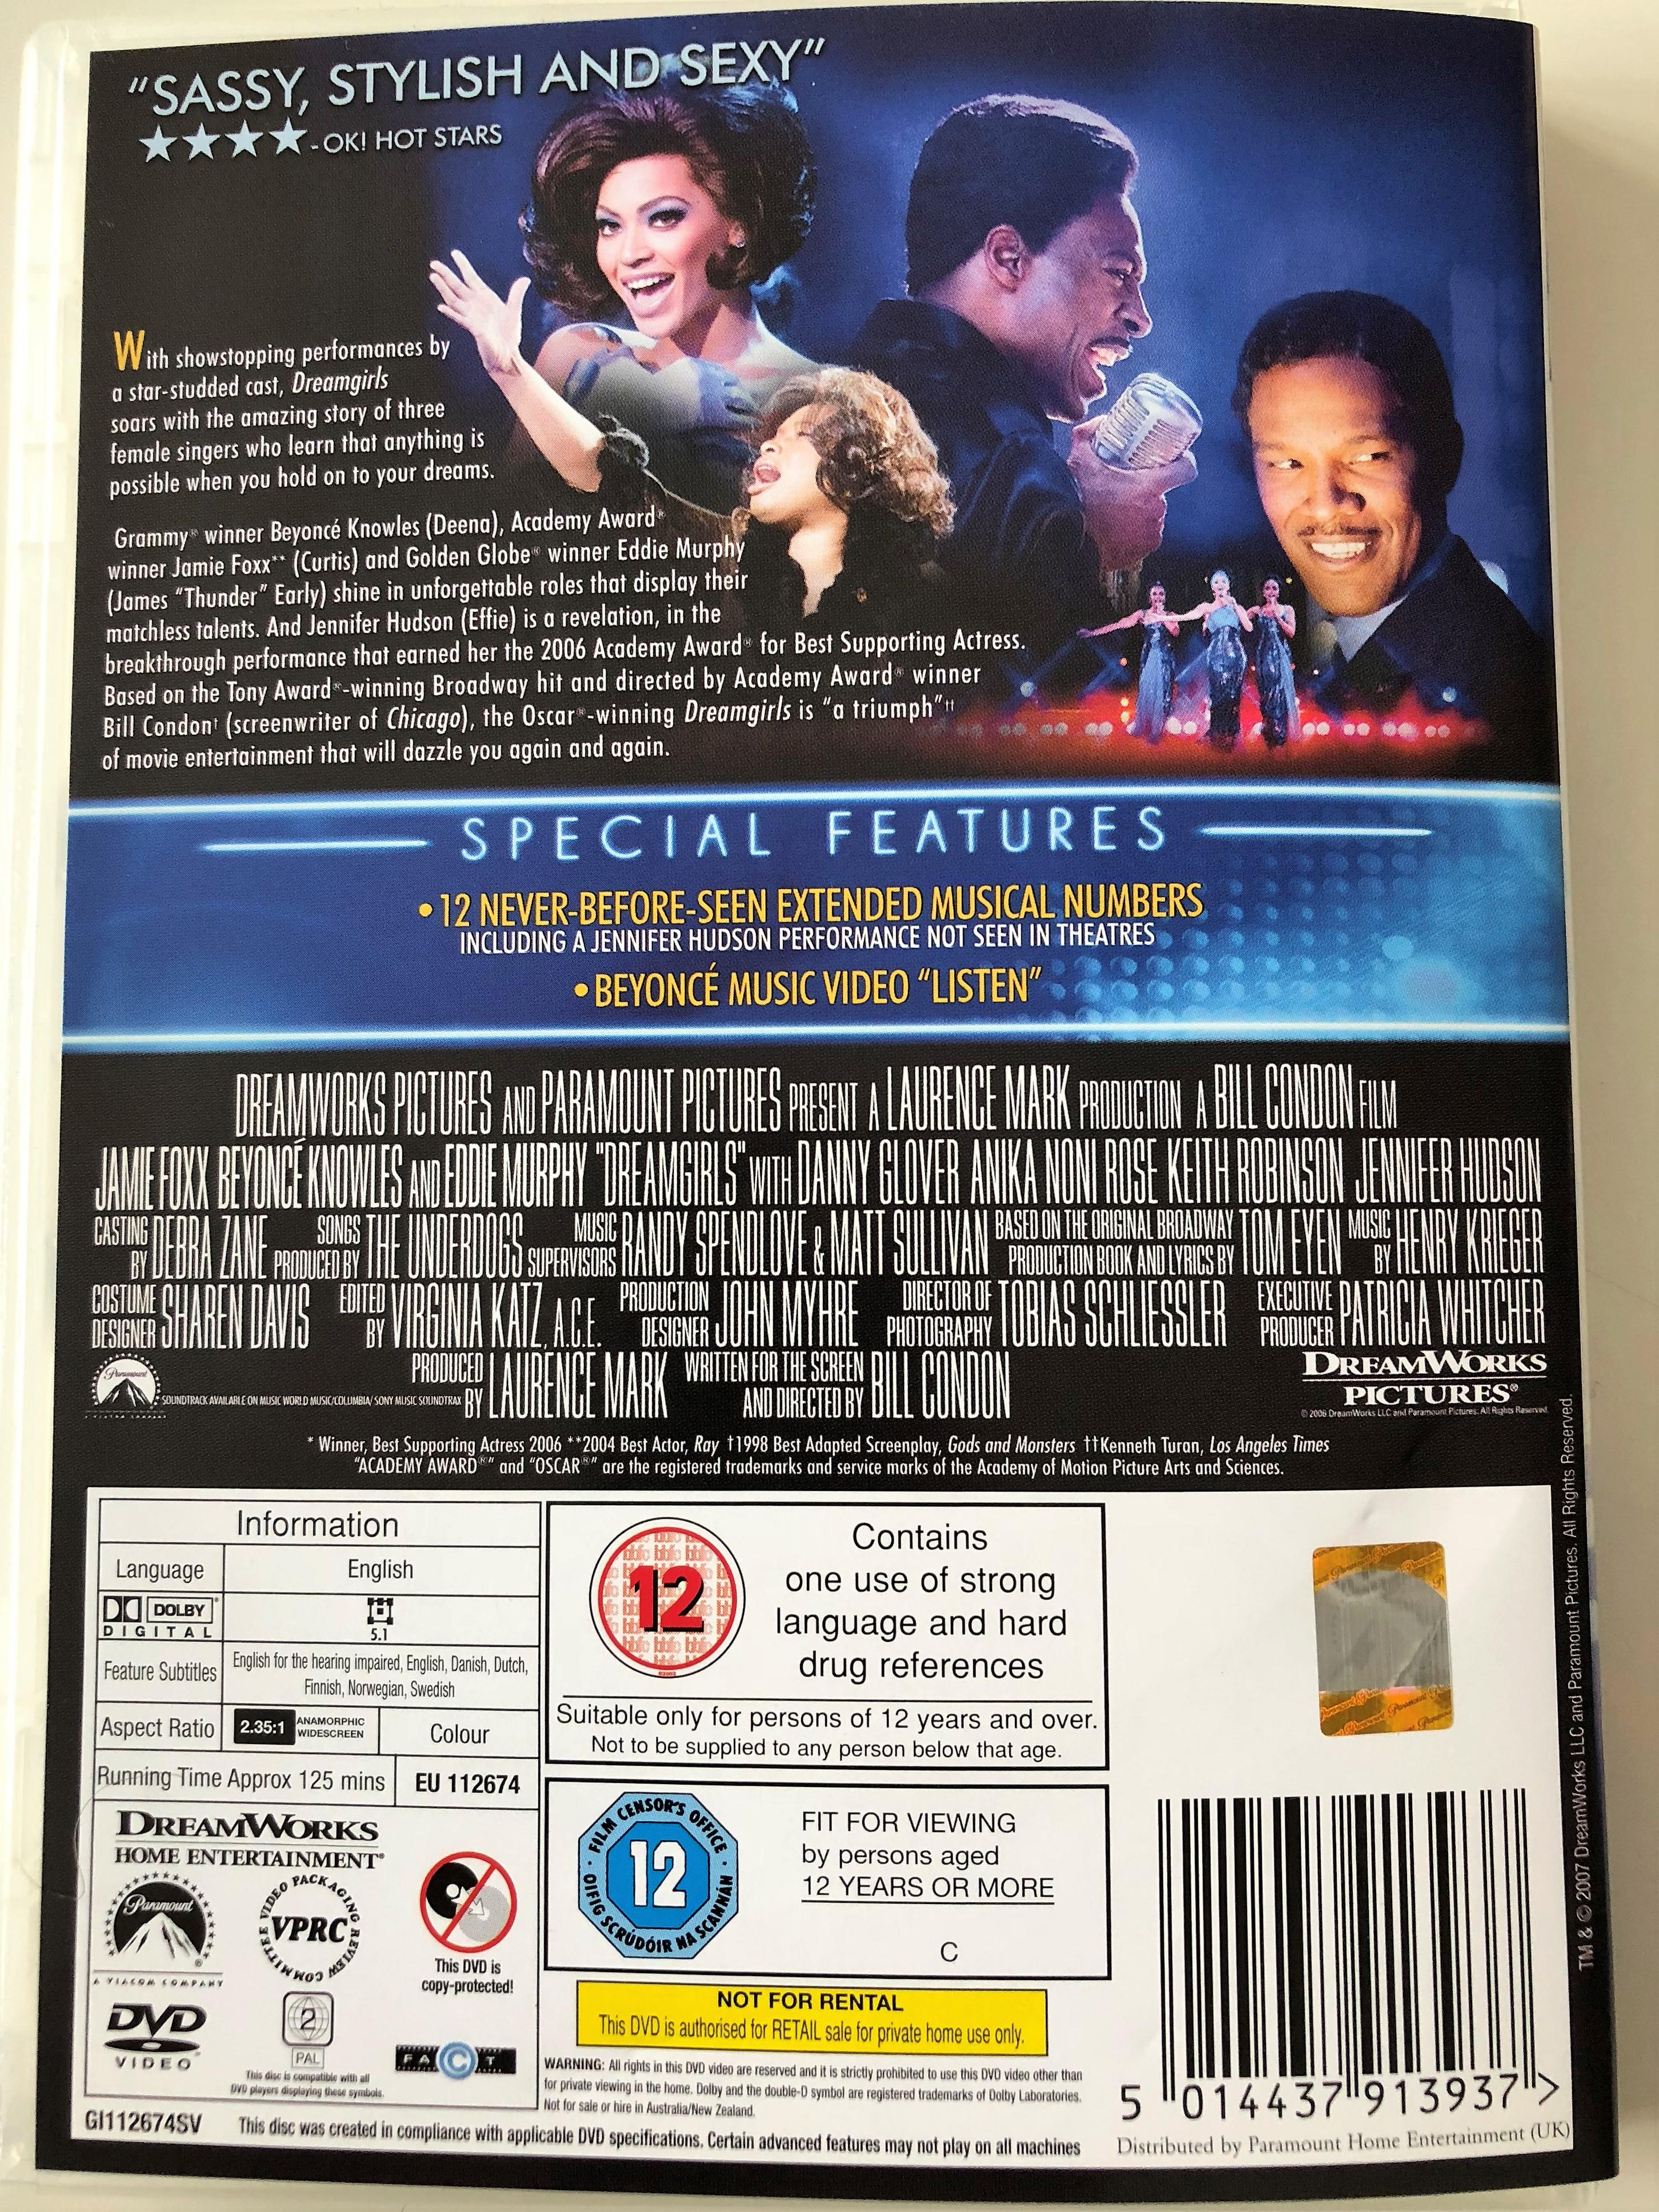 dream-girls-dvd-directed-by-bill-condon-starring-jamie-foxx-beyonc-knowles-eddie-murphy-danny-glover-anika-noni-rose-keith-robinson-jennifer-hudson-2-.jpg